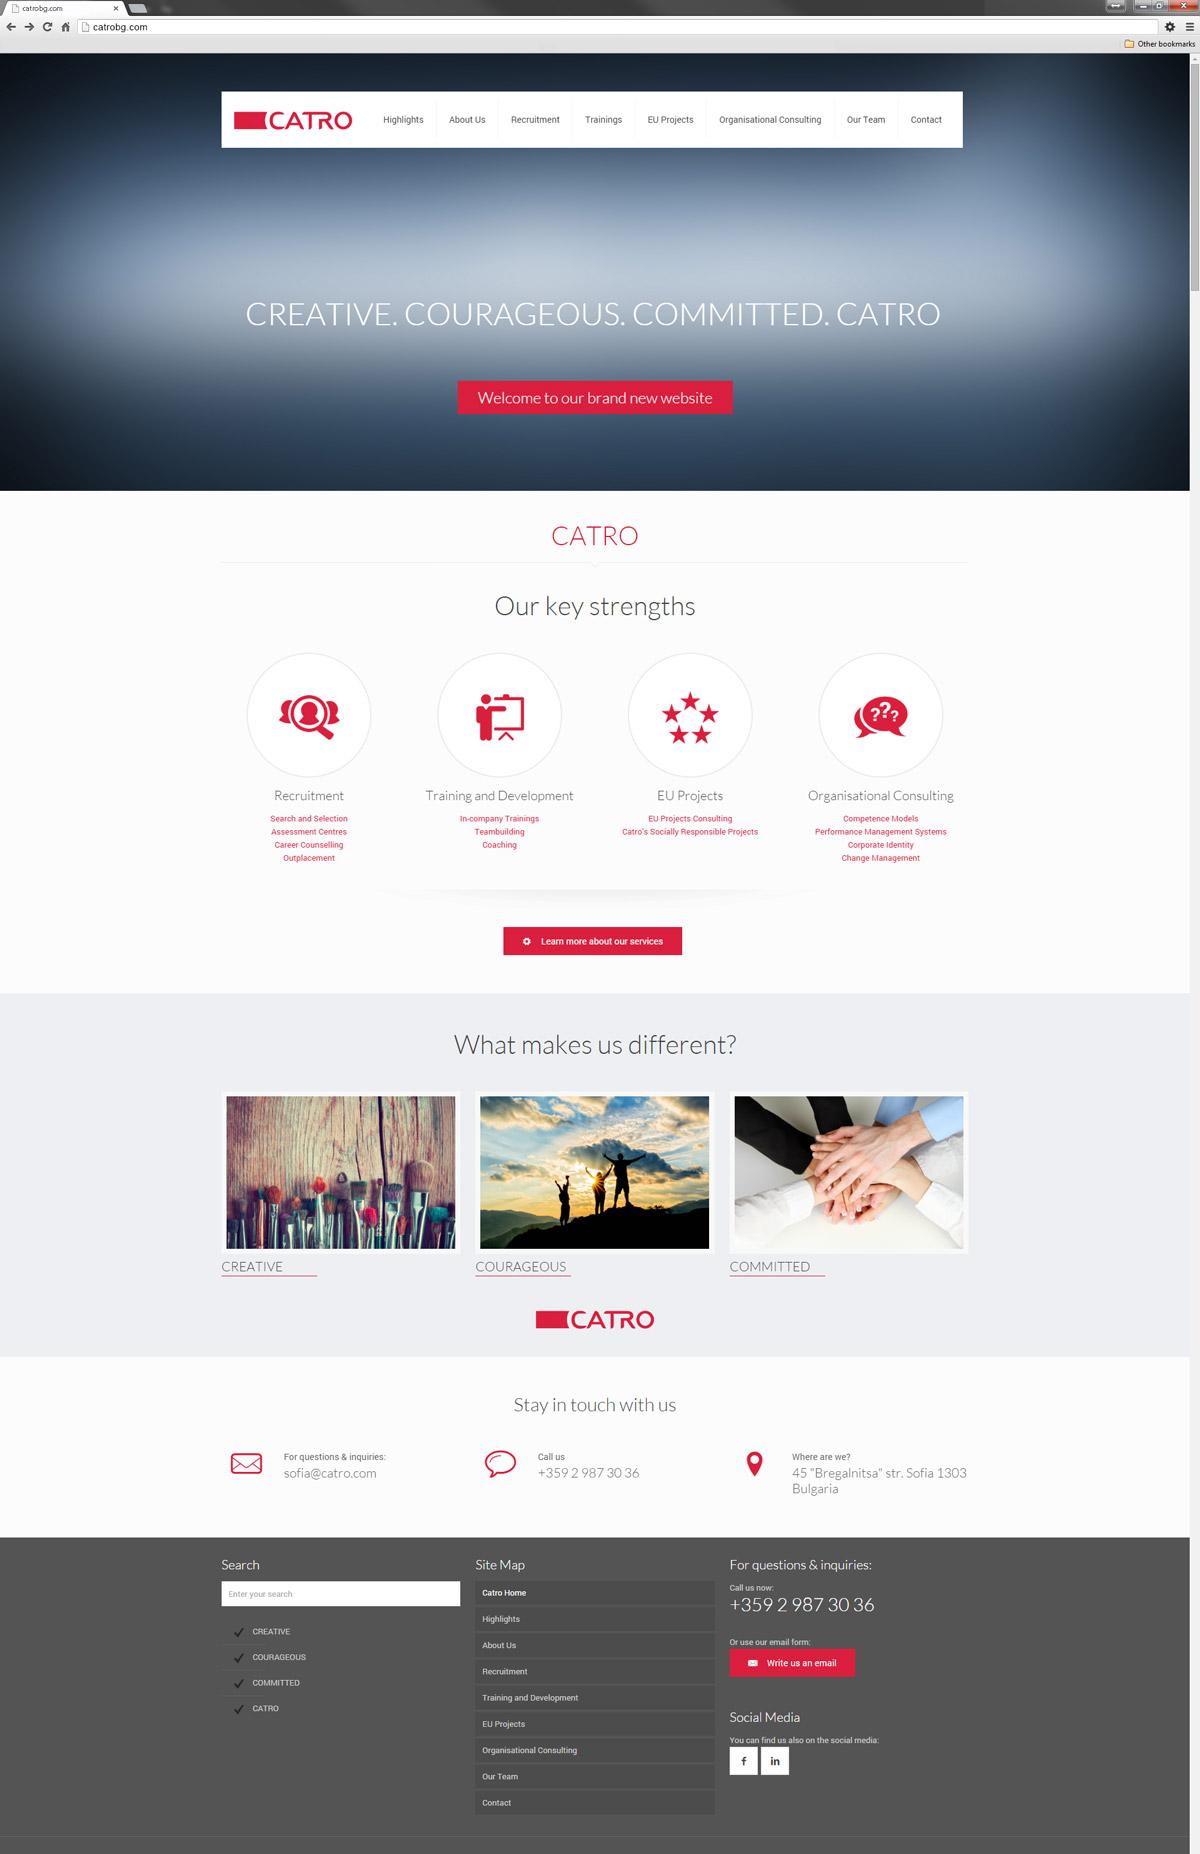 Catro_Website_05